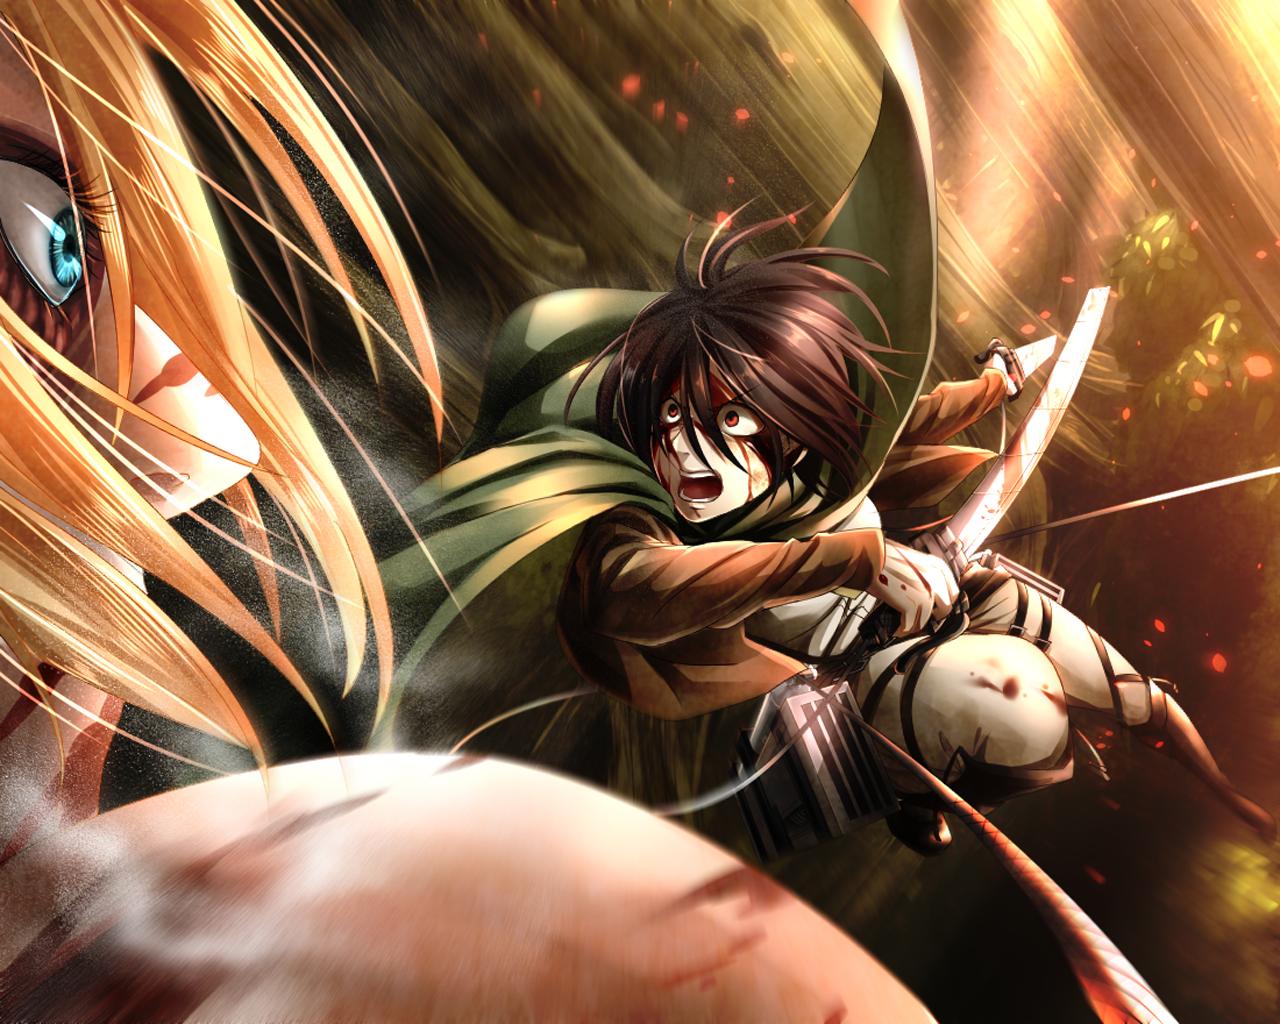 annie attack on titan wallpaper - photo #18